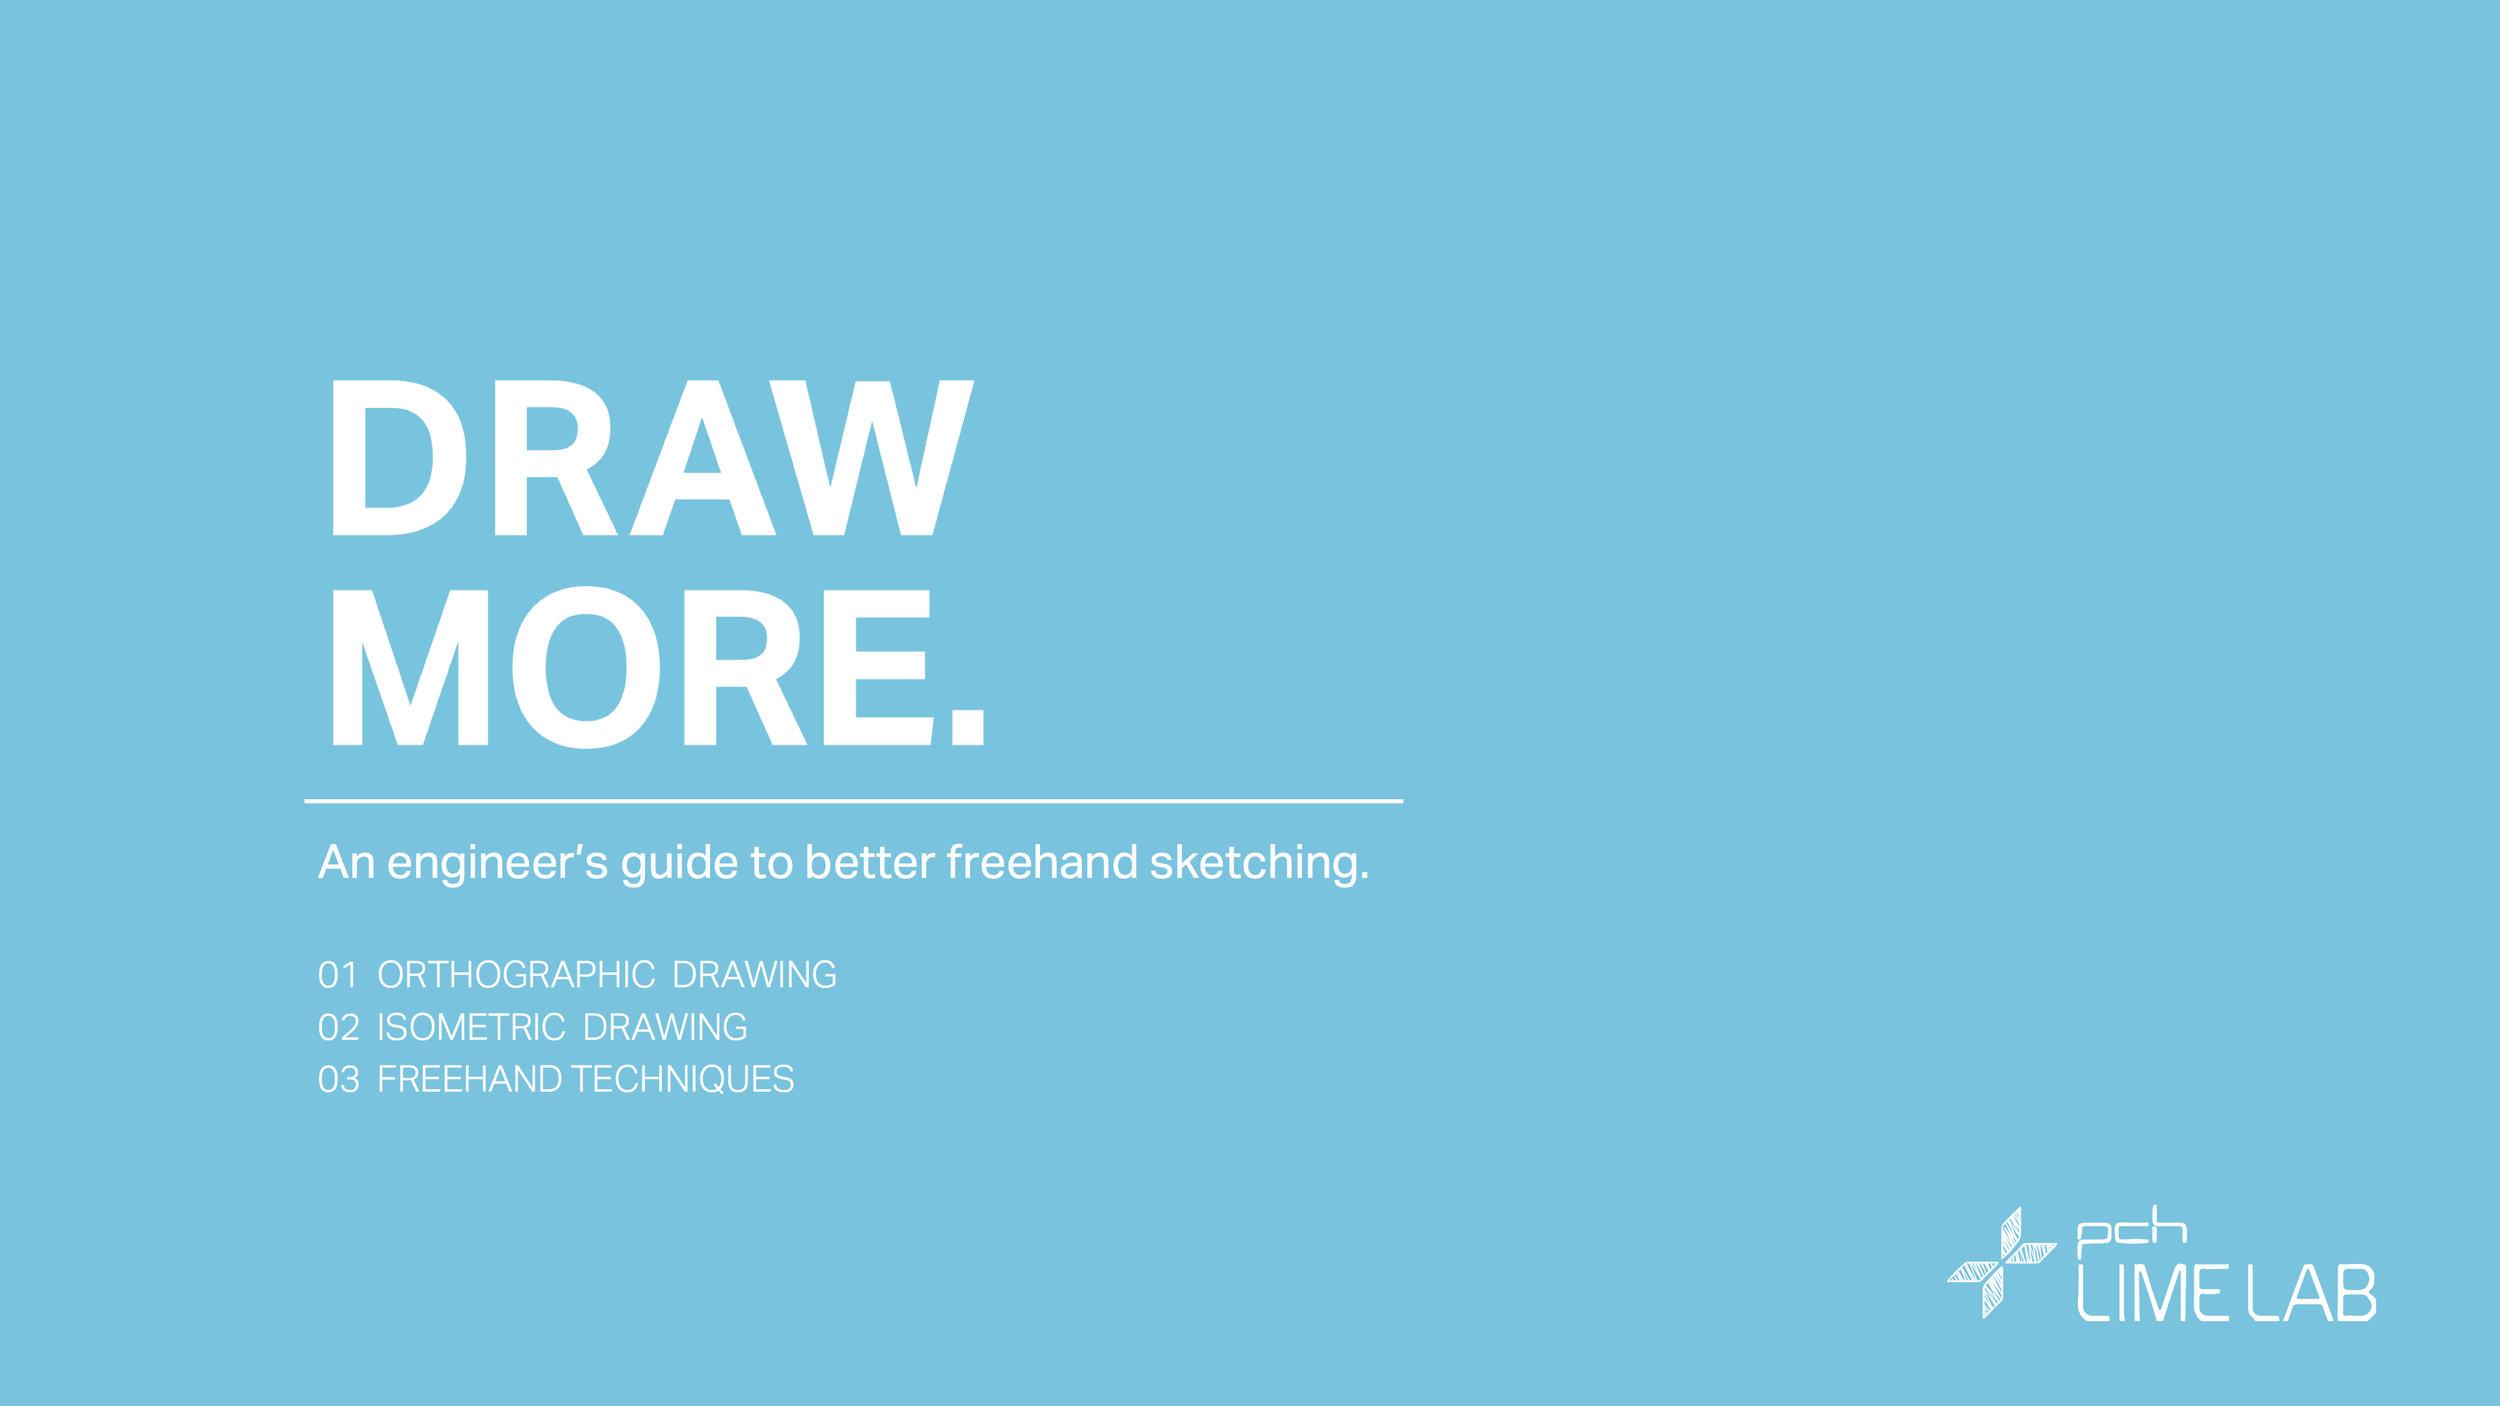 DrawingWorkshop_Presentation_07312015 (1).jpg